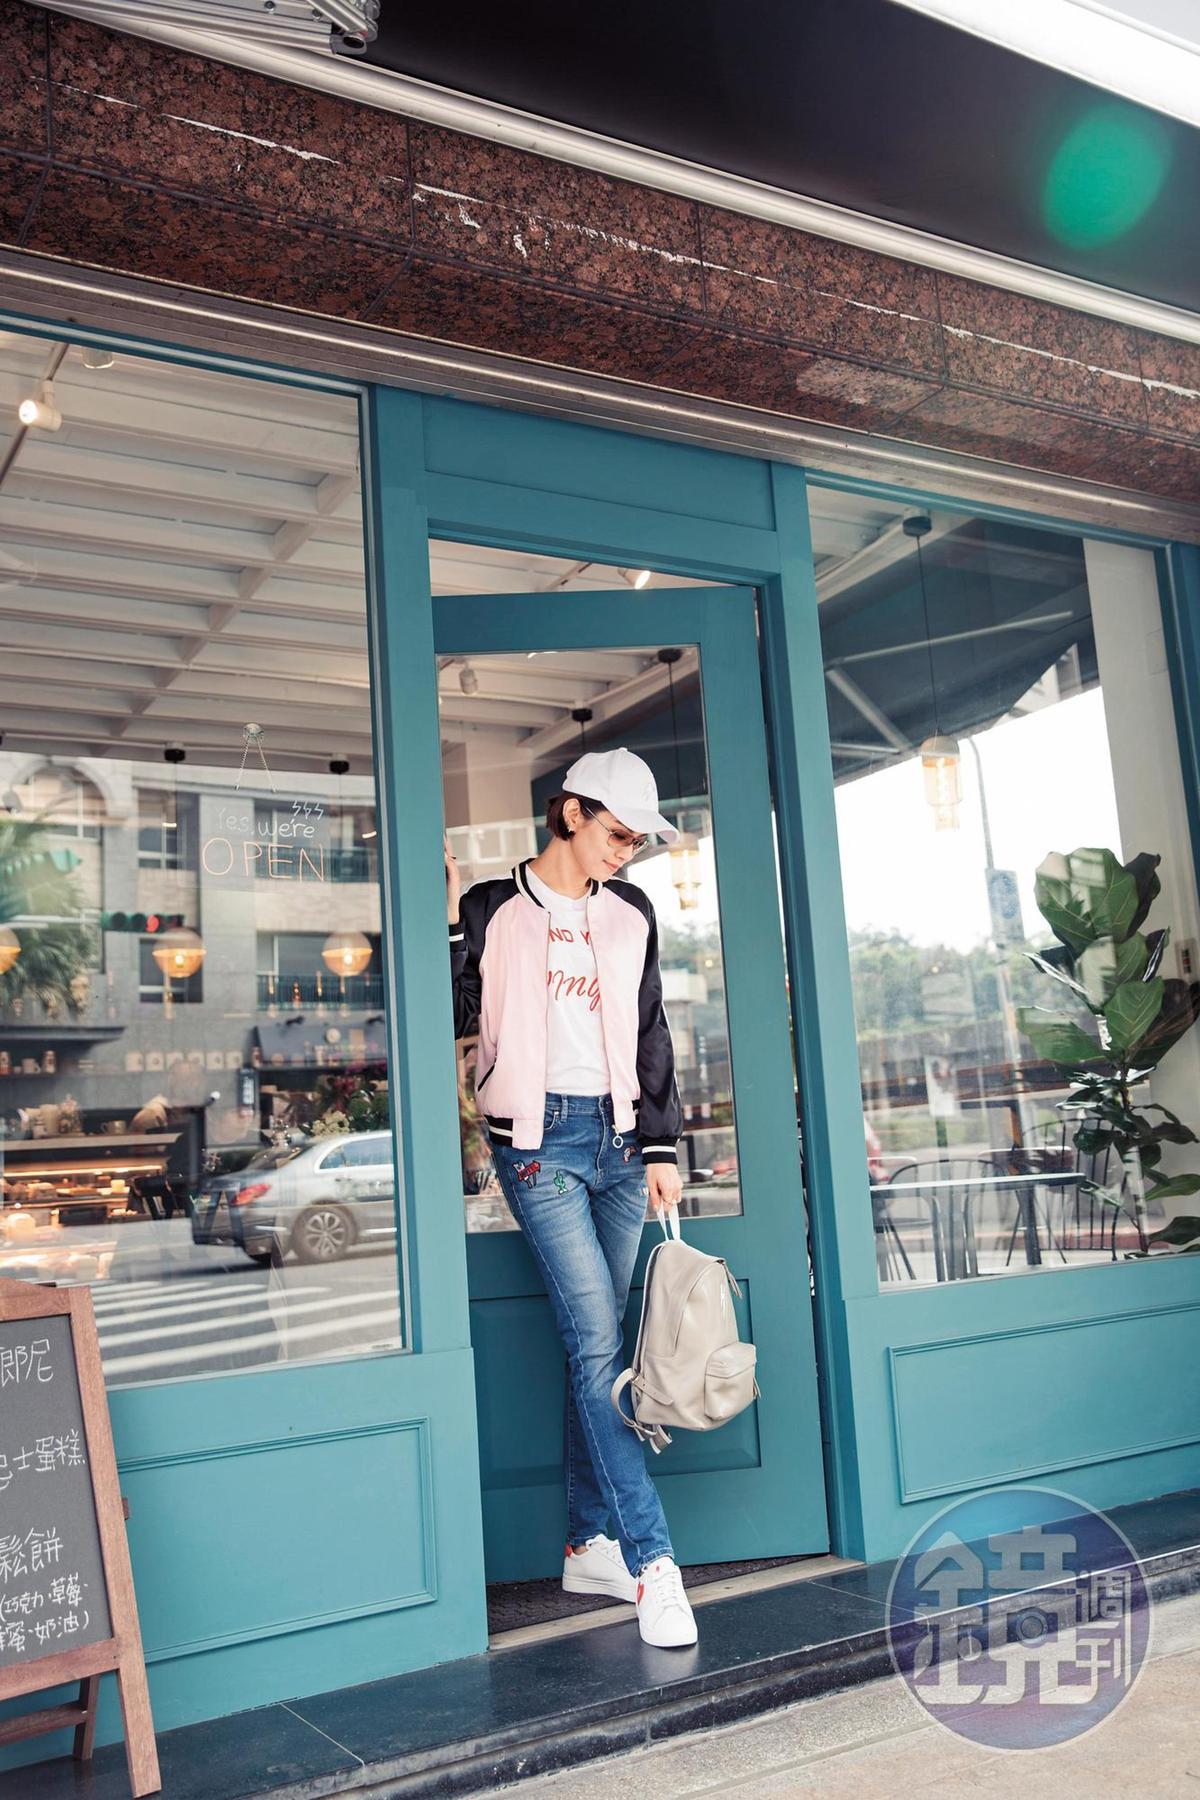 ZFASHIONASIA白色T-Shirt。NT$3,280/ZFASHIONASIA粉色棒球外套。NT$15,580/MIRA MIKATI丹寧長褲。約NT$15,000/ZFASHIONASIA白色棒球帽。NT$1,780/ZFASHIONASIA白色球鞋。NT$6,980。